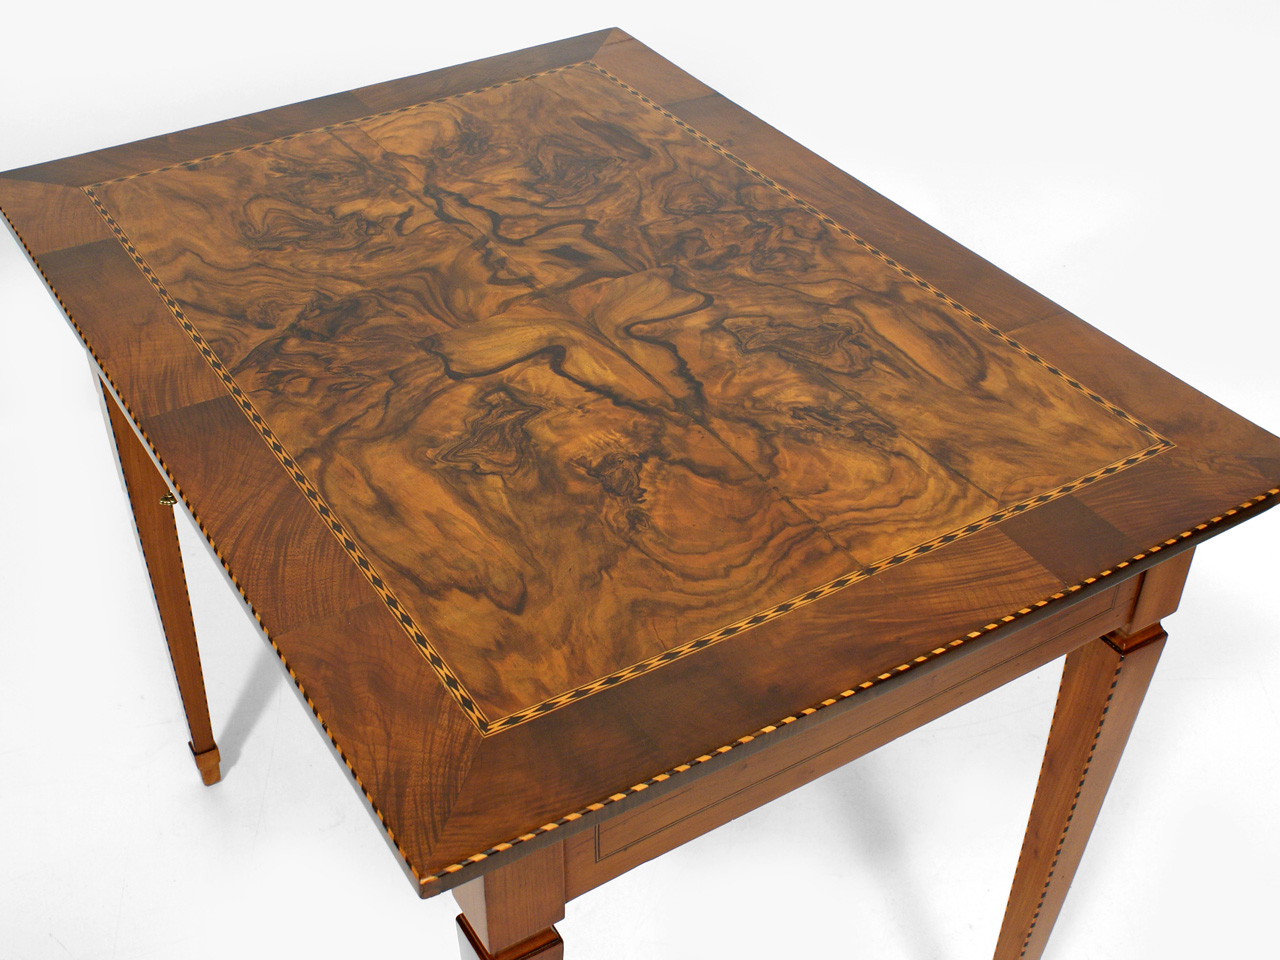 louis seize tisch kirschbaum 1 drittel 19 jh antiquit ten am markt t bingen. Black Bedroom Furniture Sets. Home Design Ideas